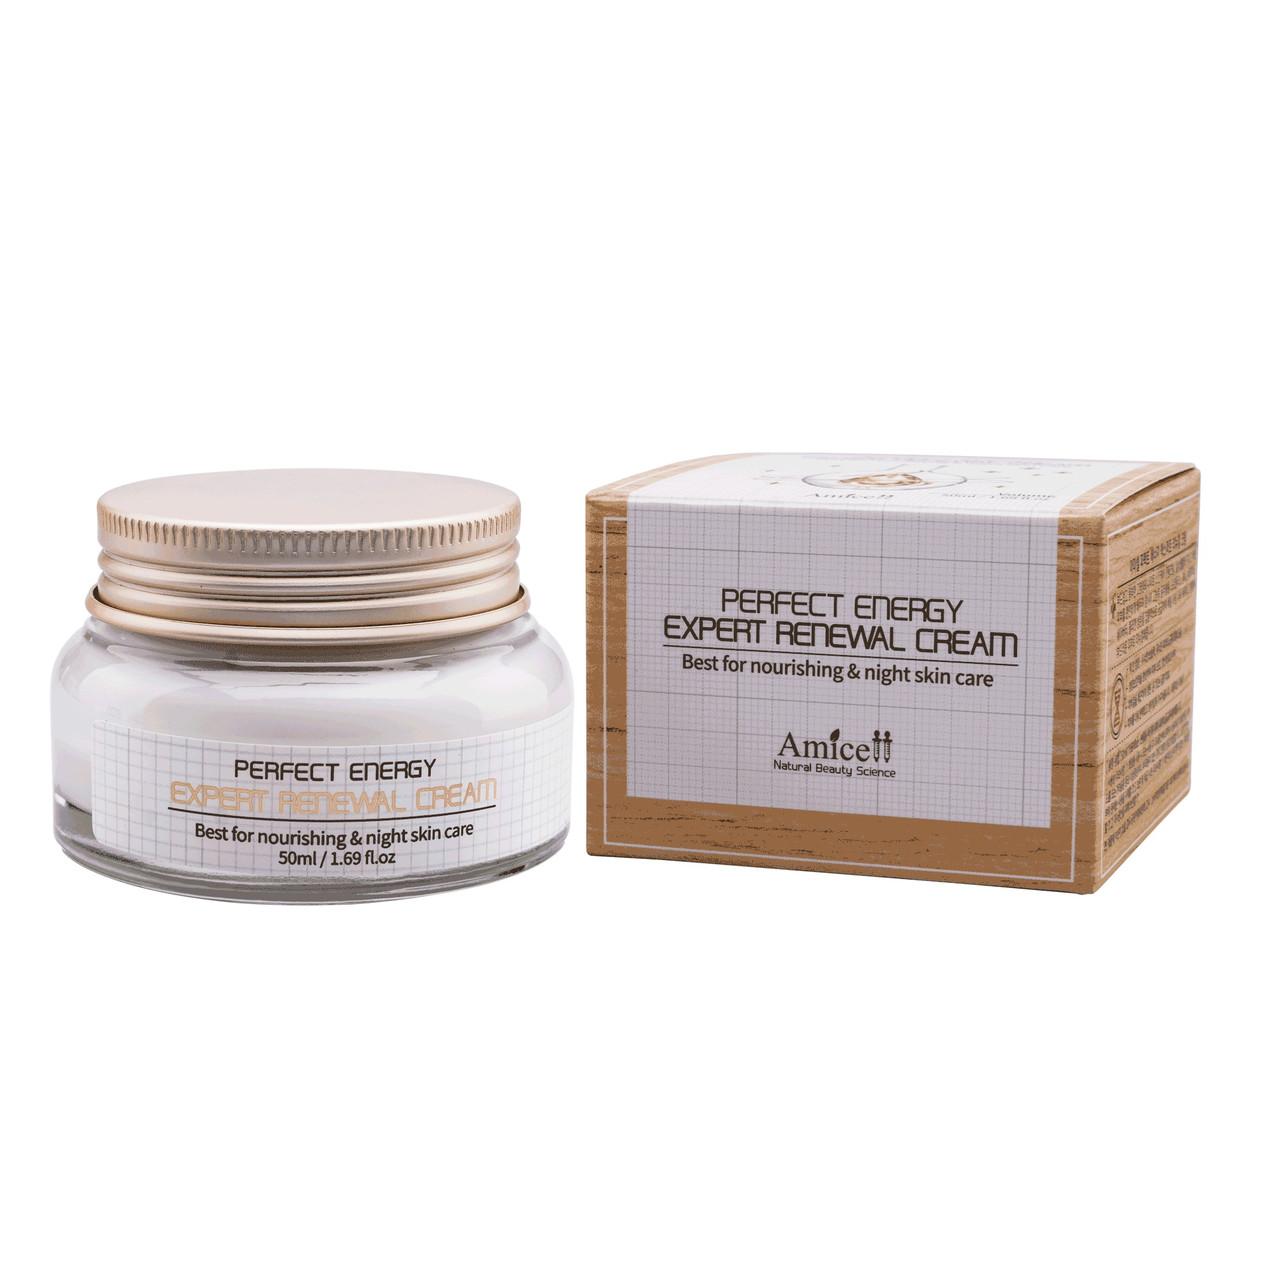 Ночной восстанавливающий крем для лица Amicell Perfect Energy Expert Renewal Cream, 50мл